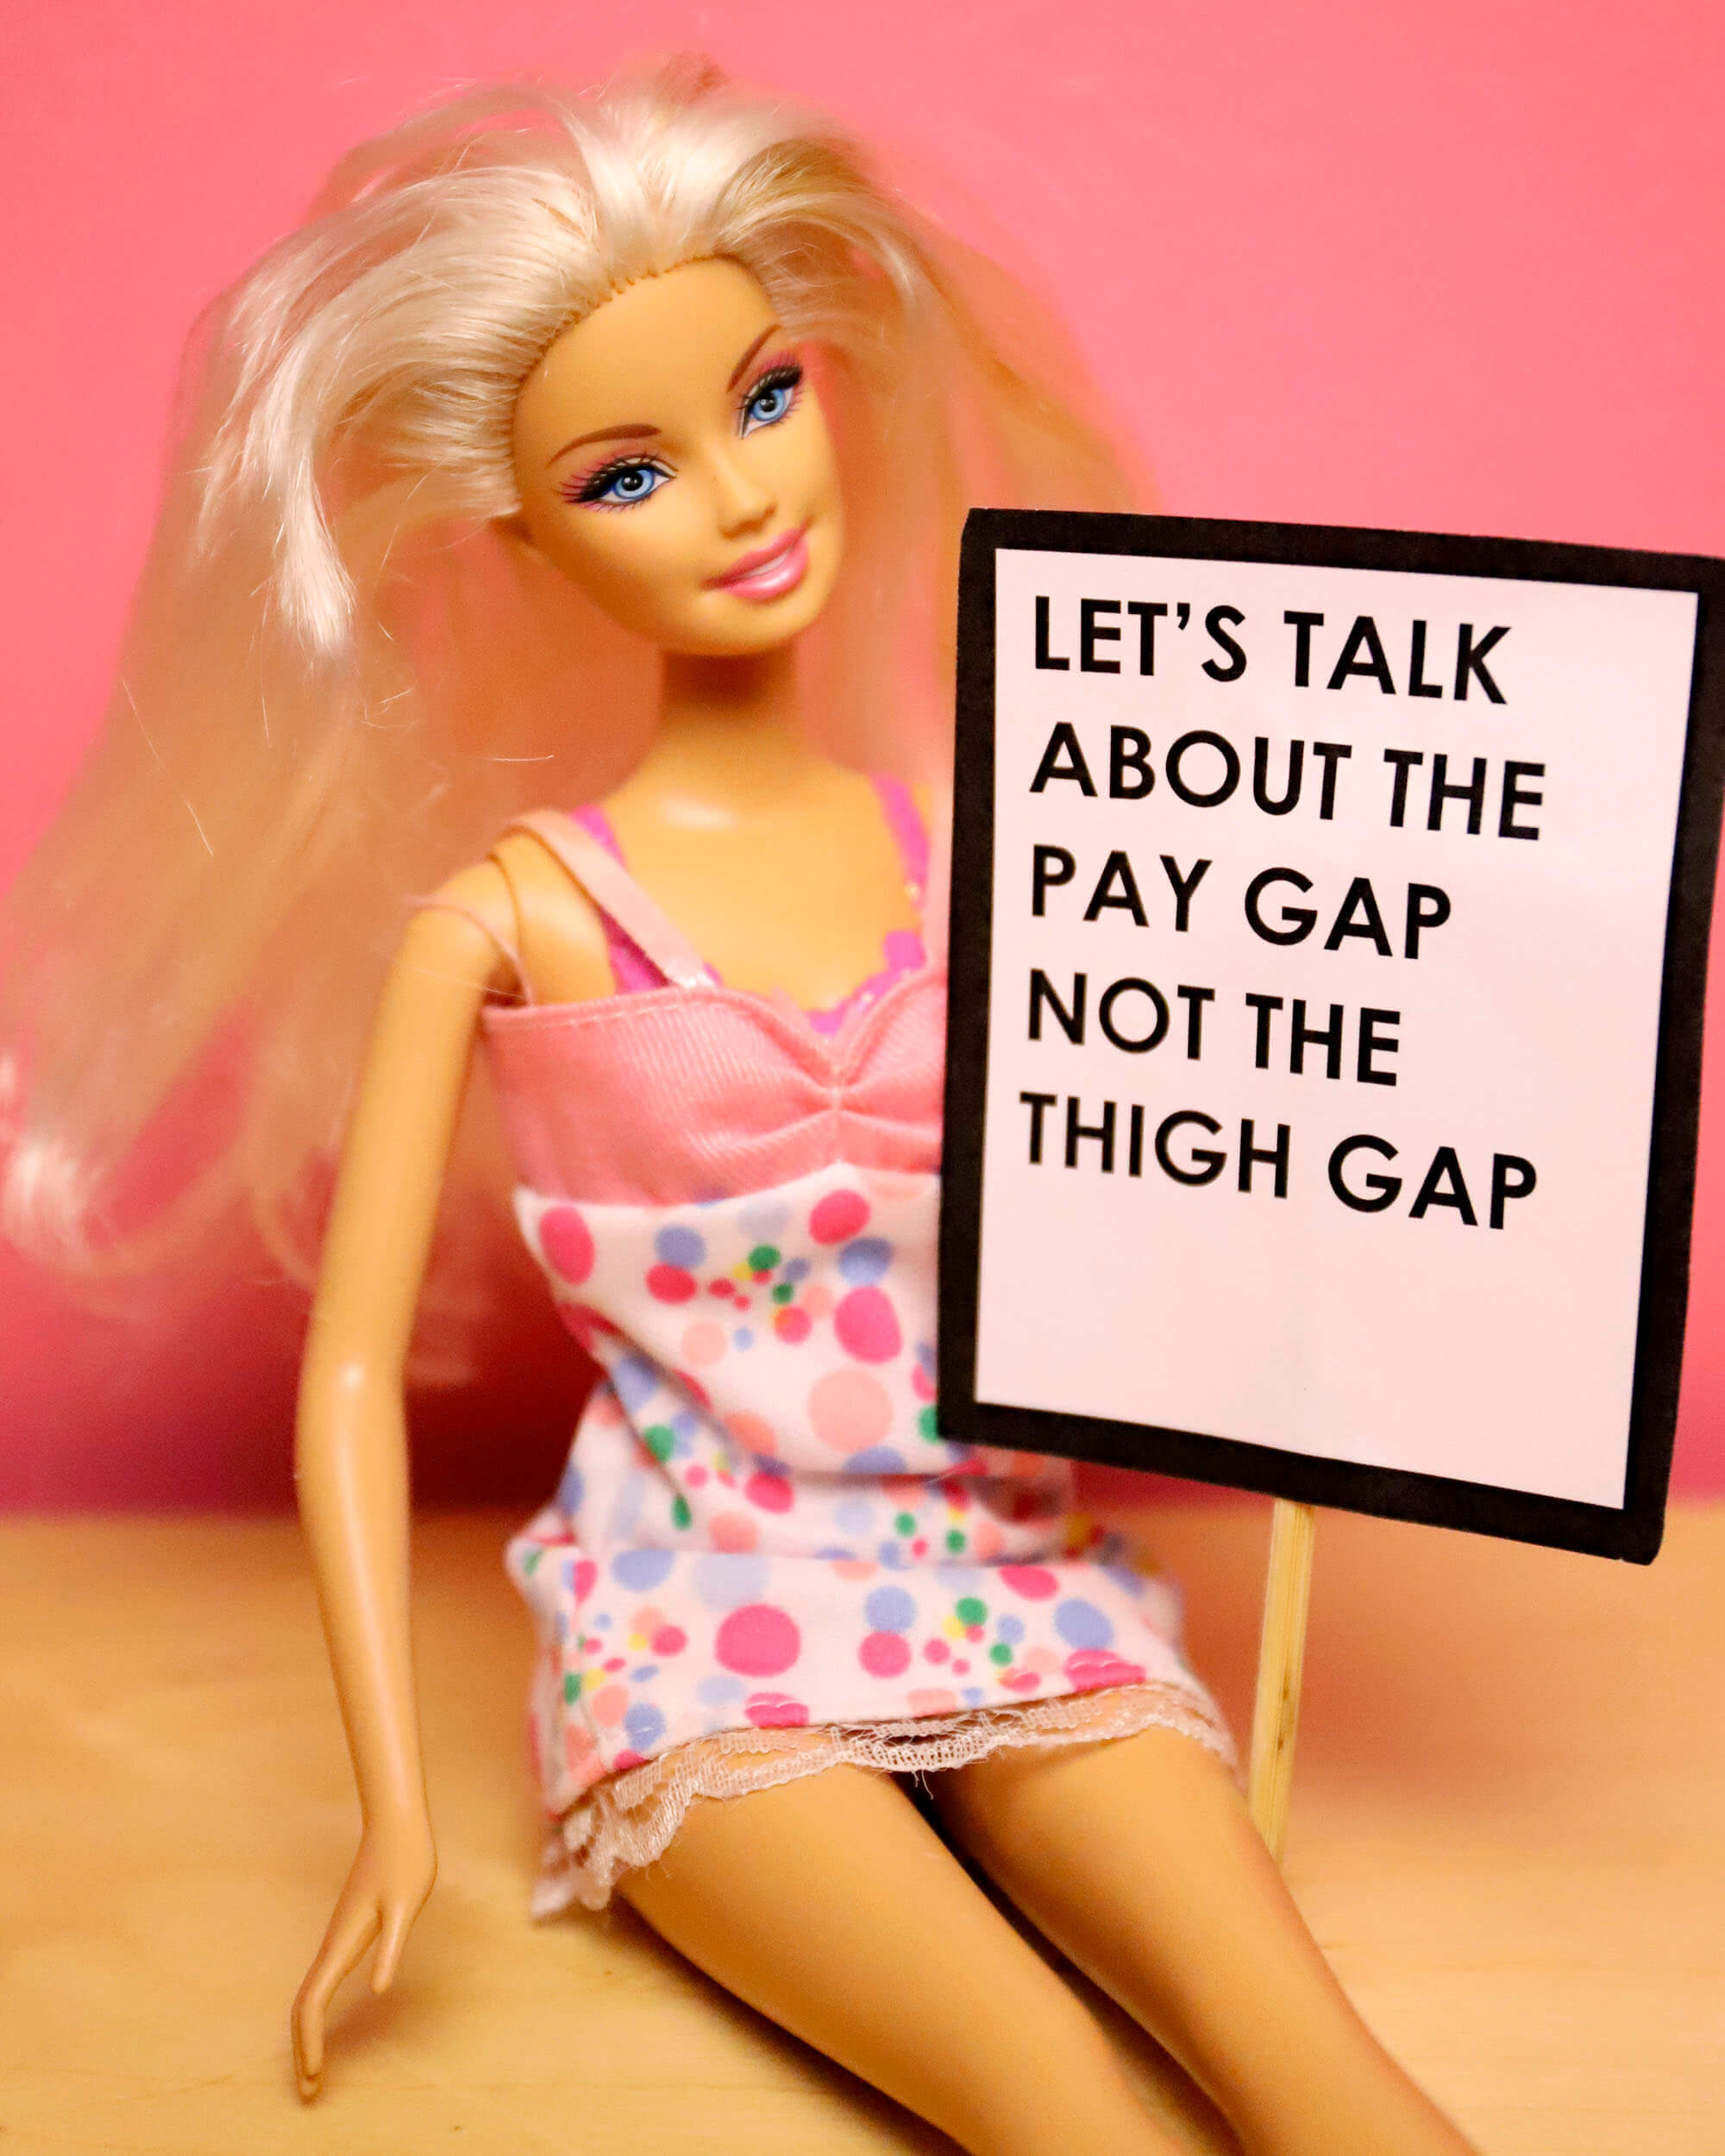 Gender pay gap image Zoë Bateman